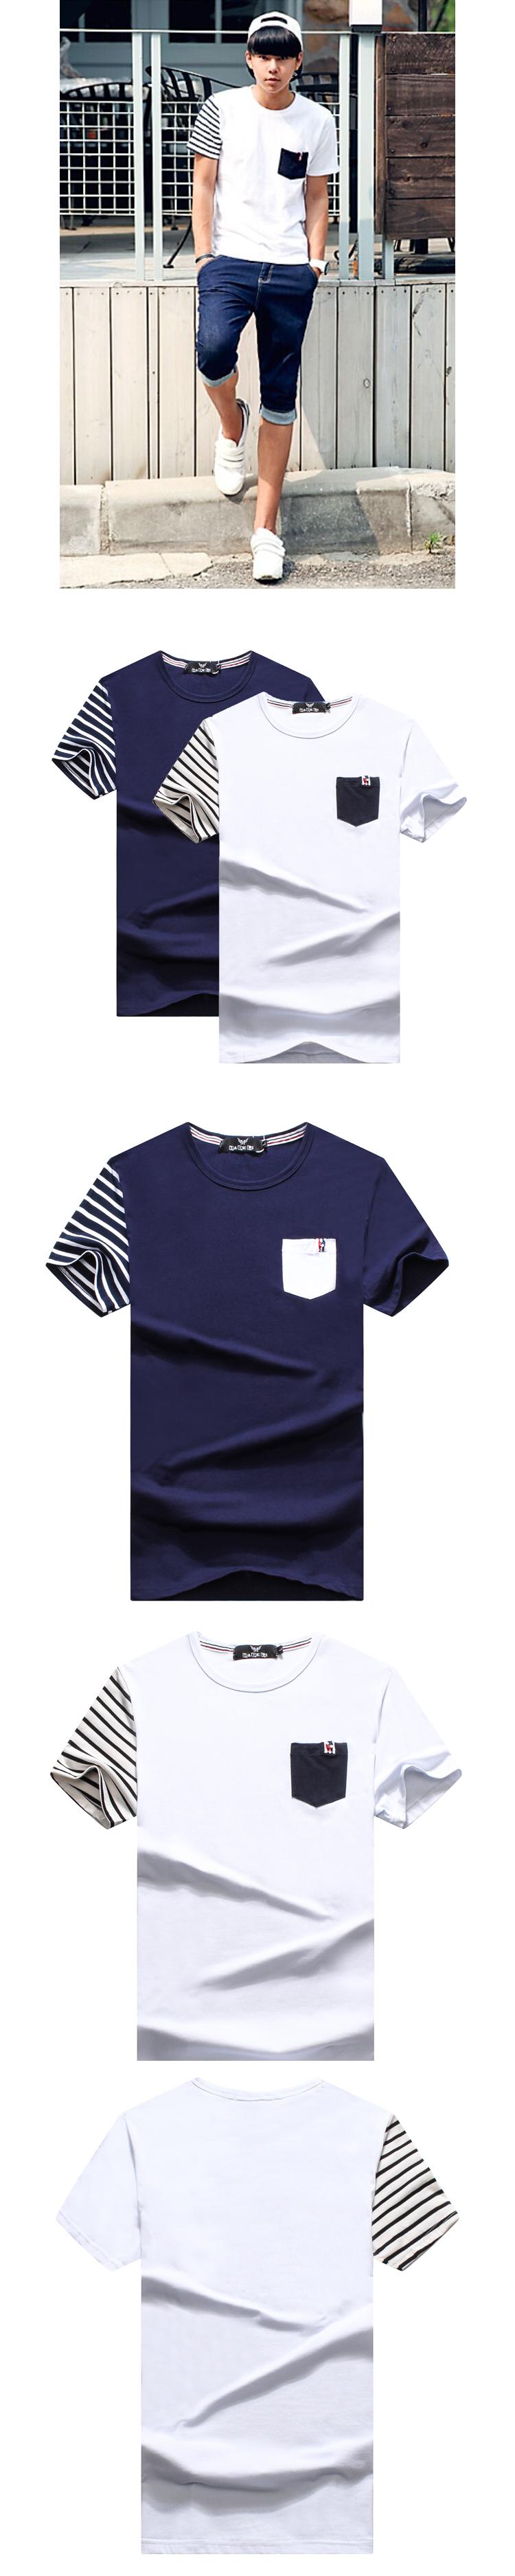 T恤.班服.潮T.最佳情侶裝.純棉短T.單袖線條國旗釦【M50205】可單買.艾咪E舖